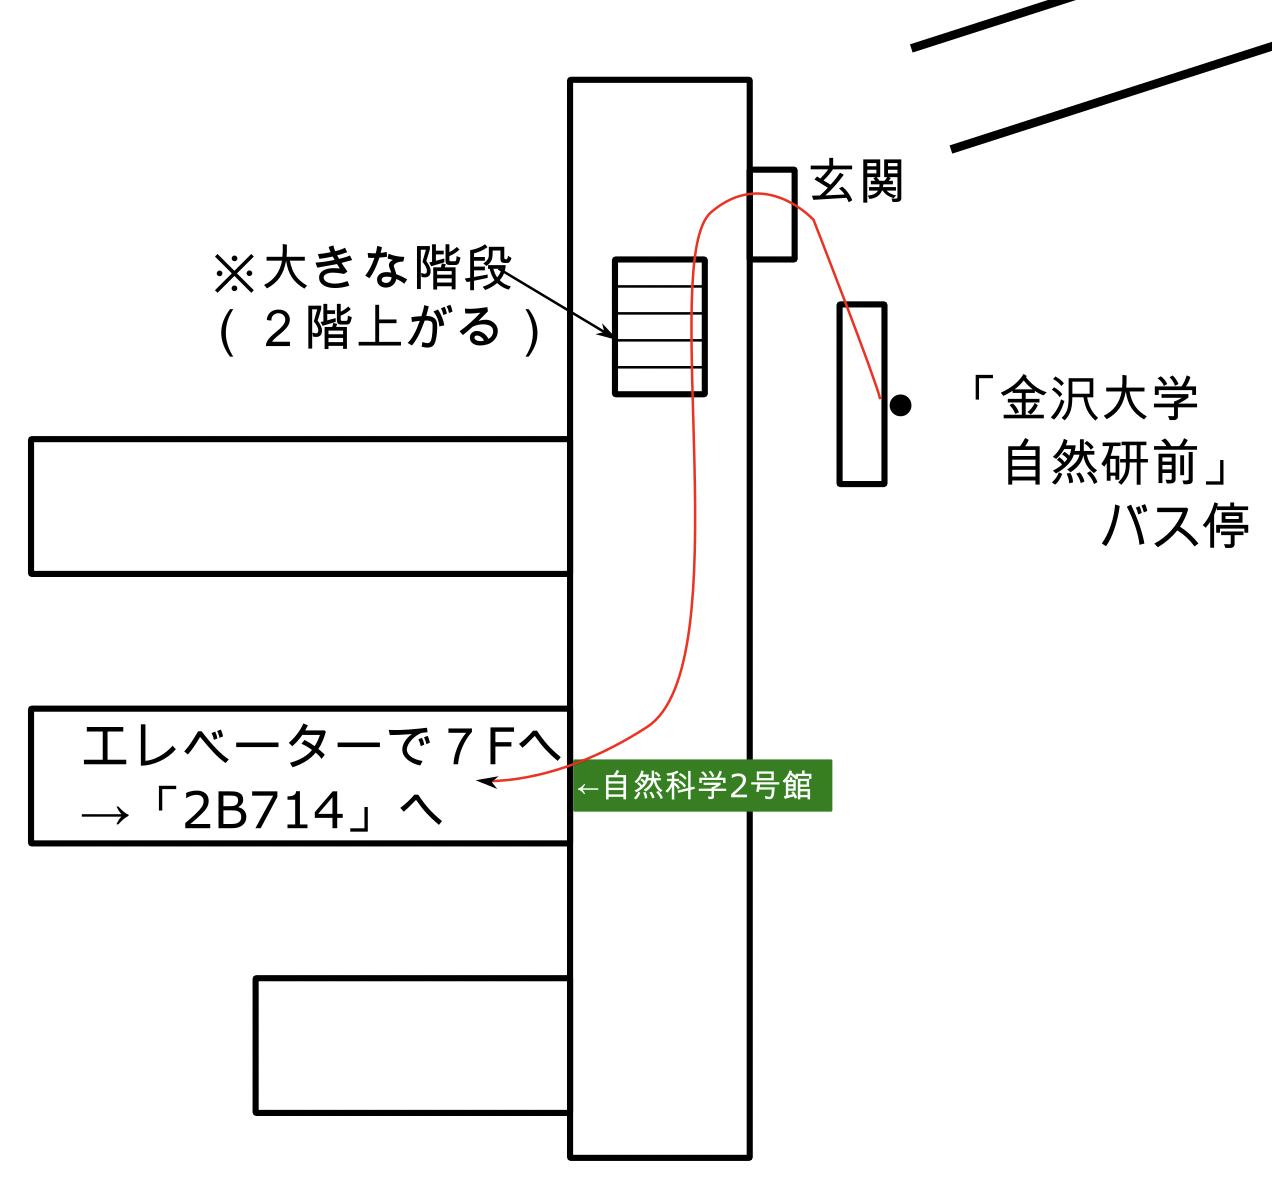 accessmap_bus.png